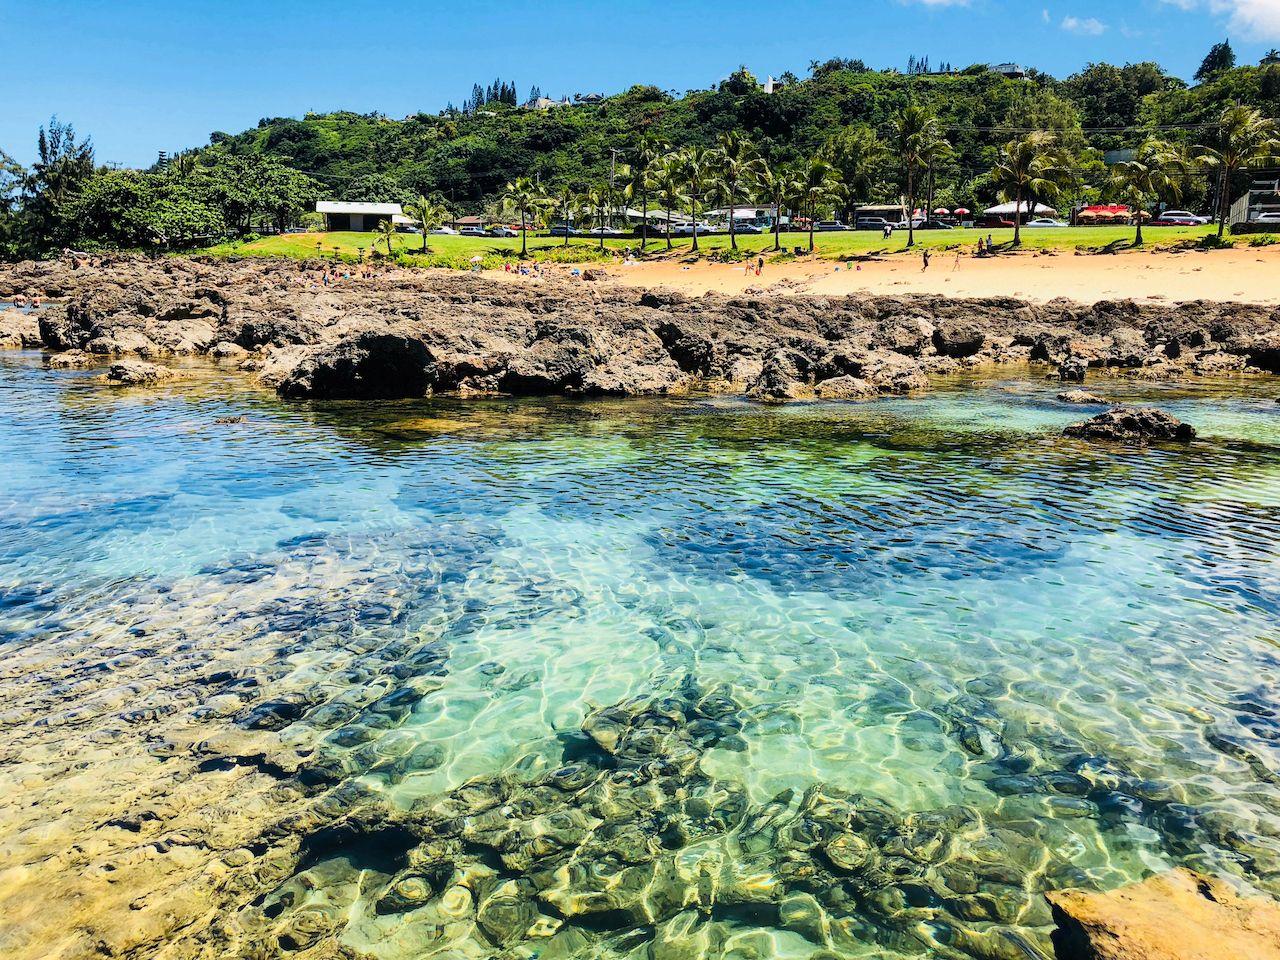 Shark's Cove North Shore, Oahu beaches for families